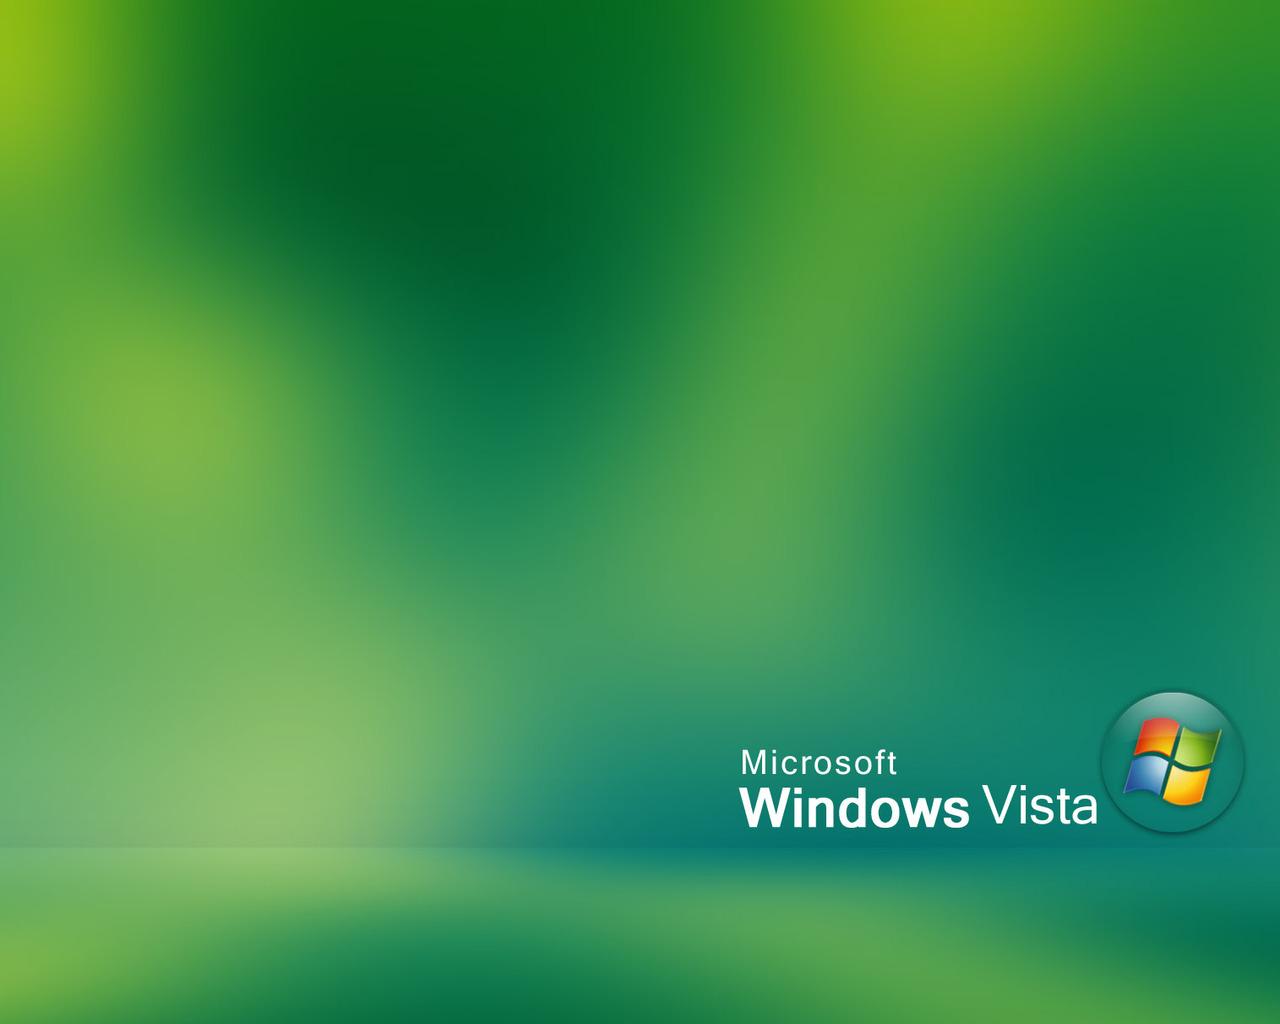 1920x1200 windows vista green - photo #8